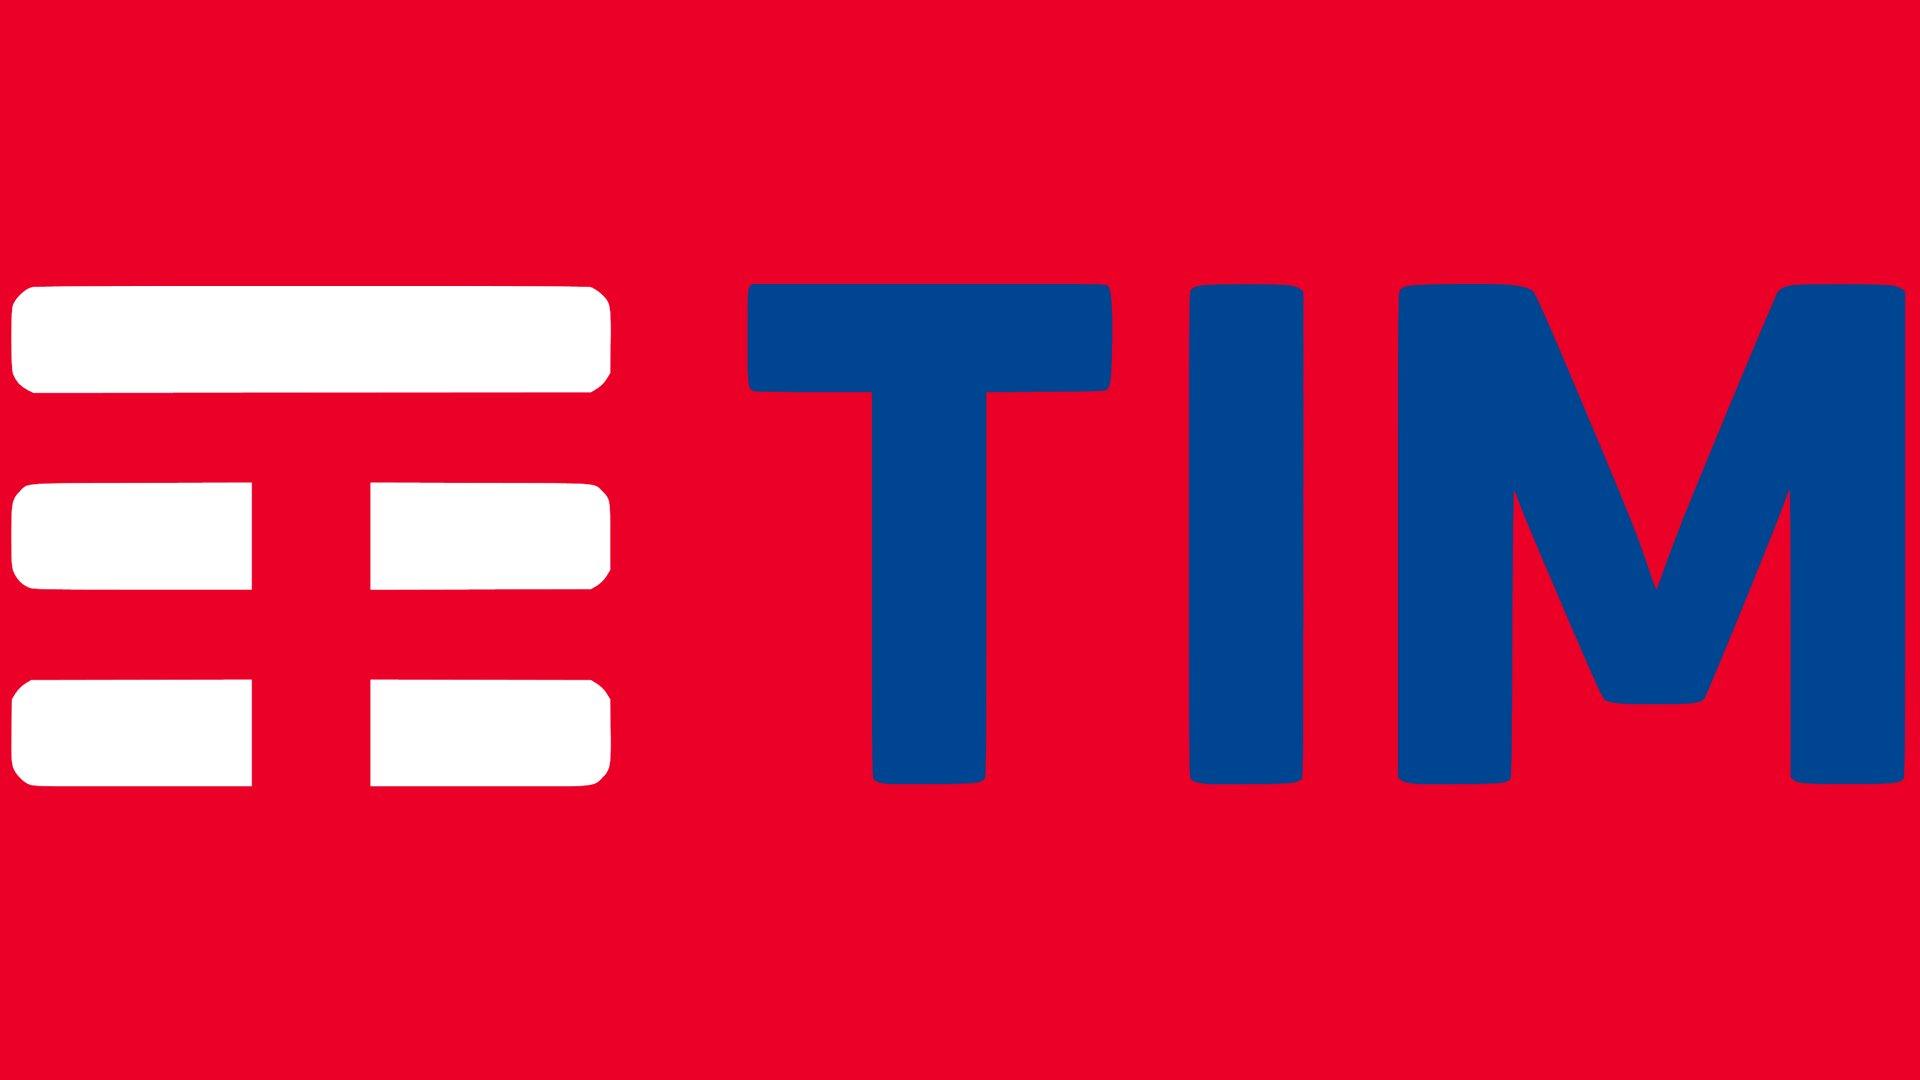 tim logo tim symbol meaning history and evolution